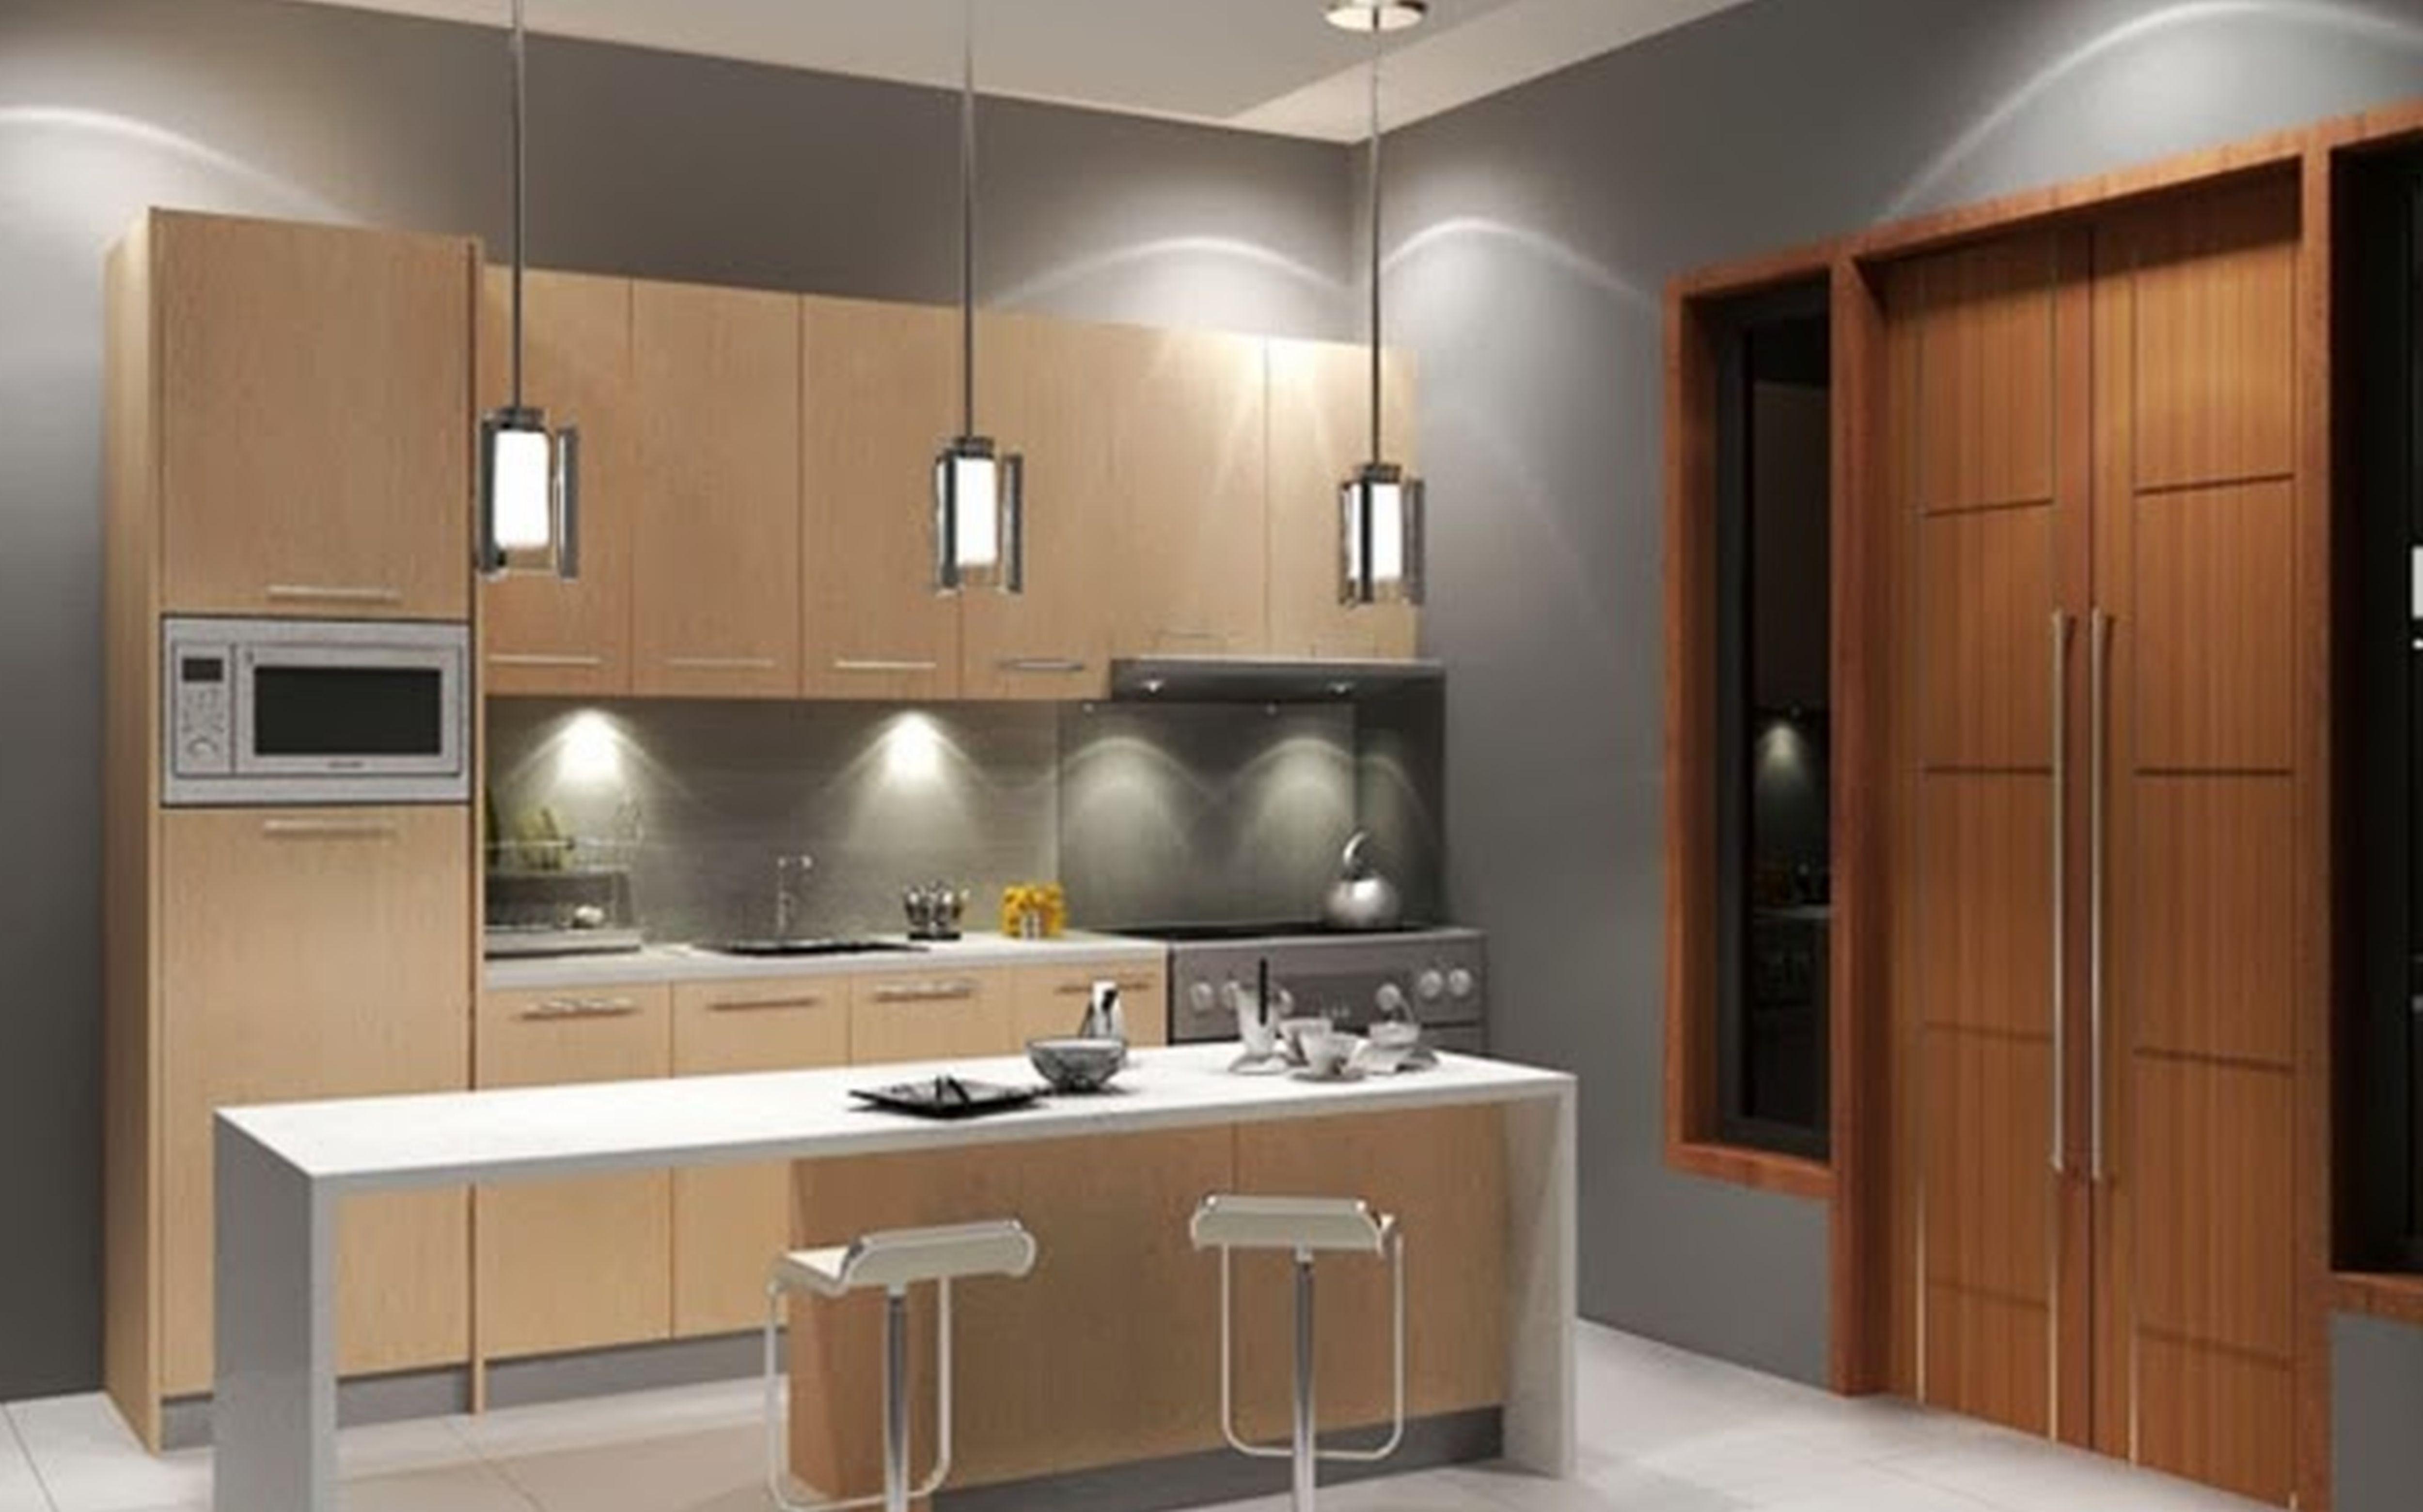 Exterior Home Design Kitchen Design Download Software Design Ideas Interior Design Software Home Design Software Desain Dapur Modern Interior Dapur Model Dapur